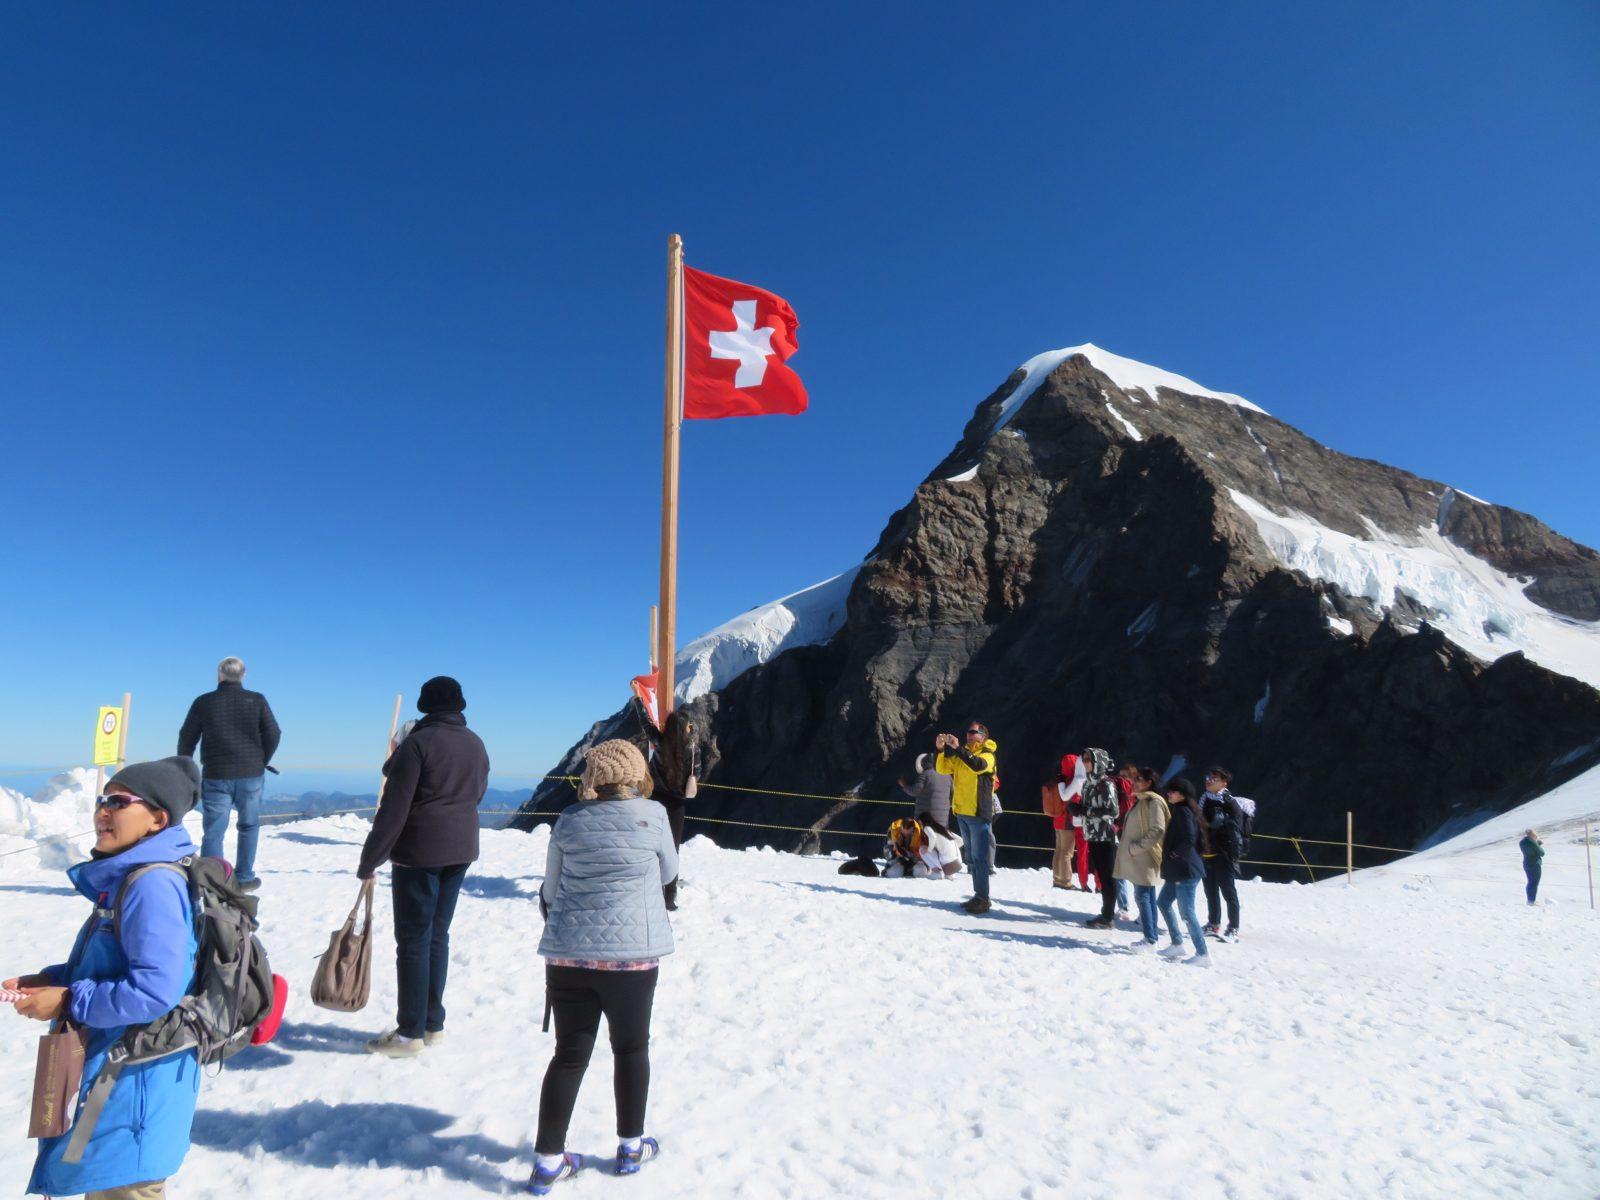 Grindelwald and the Jungfrau